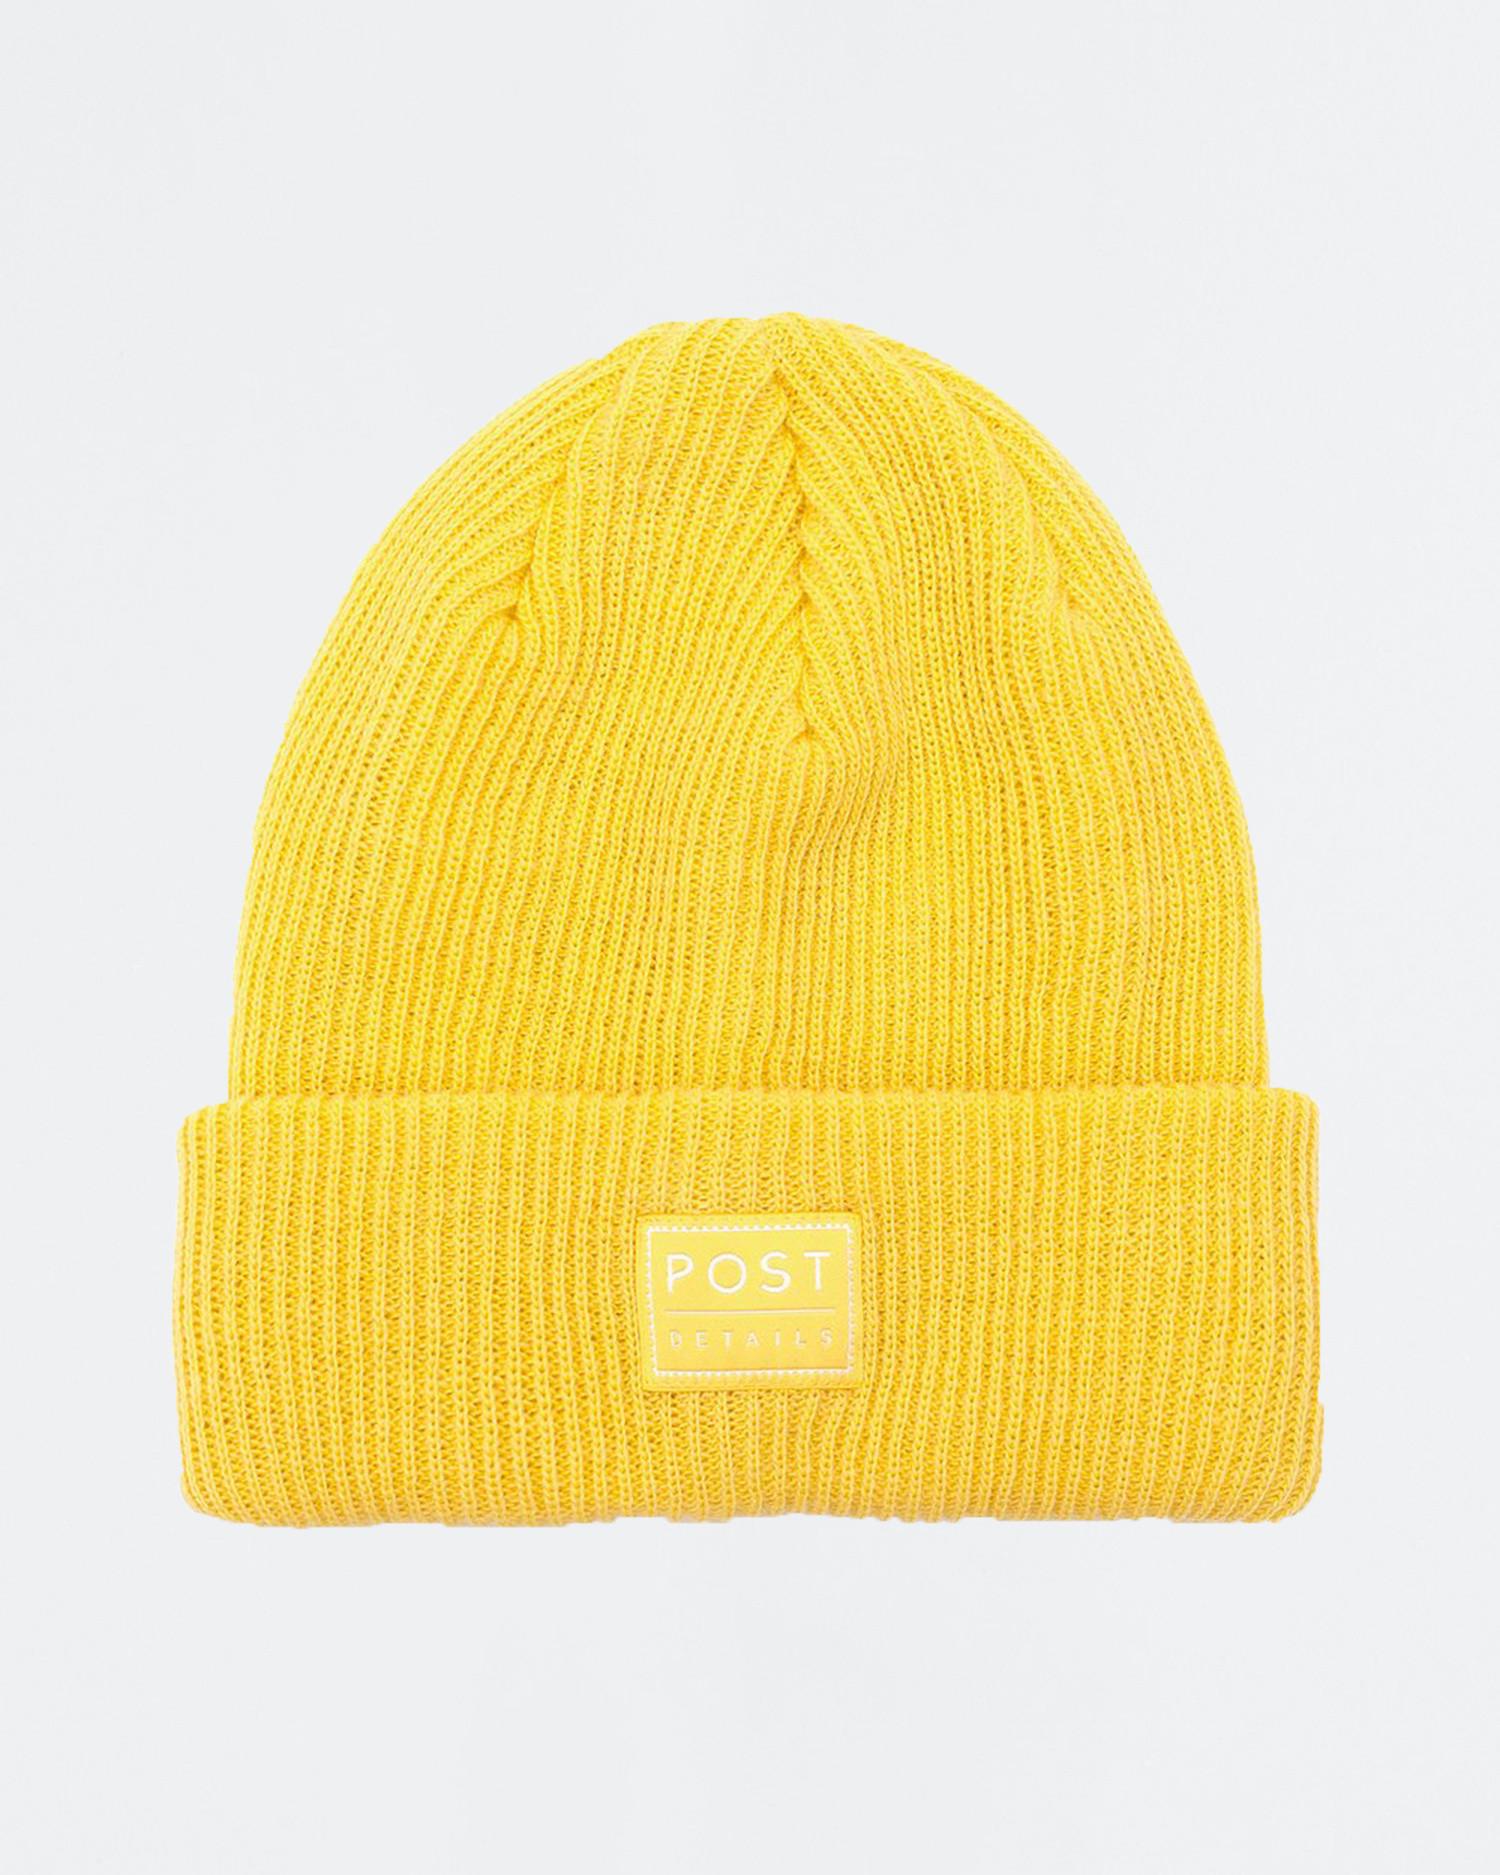 Post ABC Classic Beanie V7 Lemon Yellow